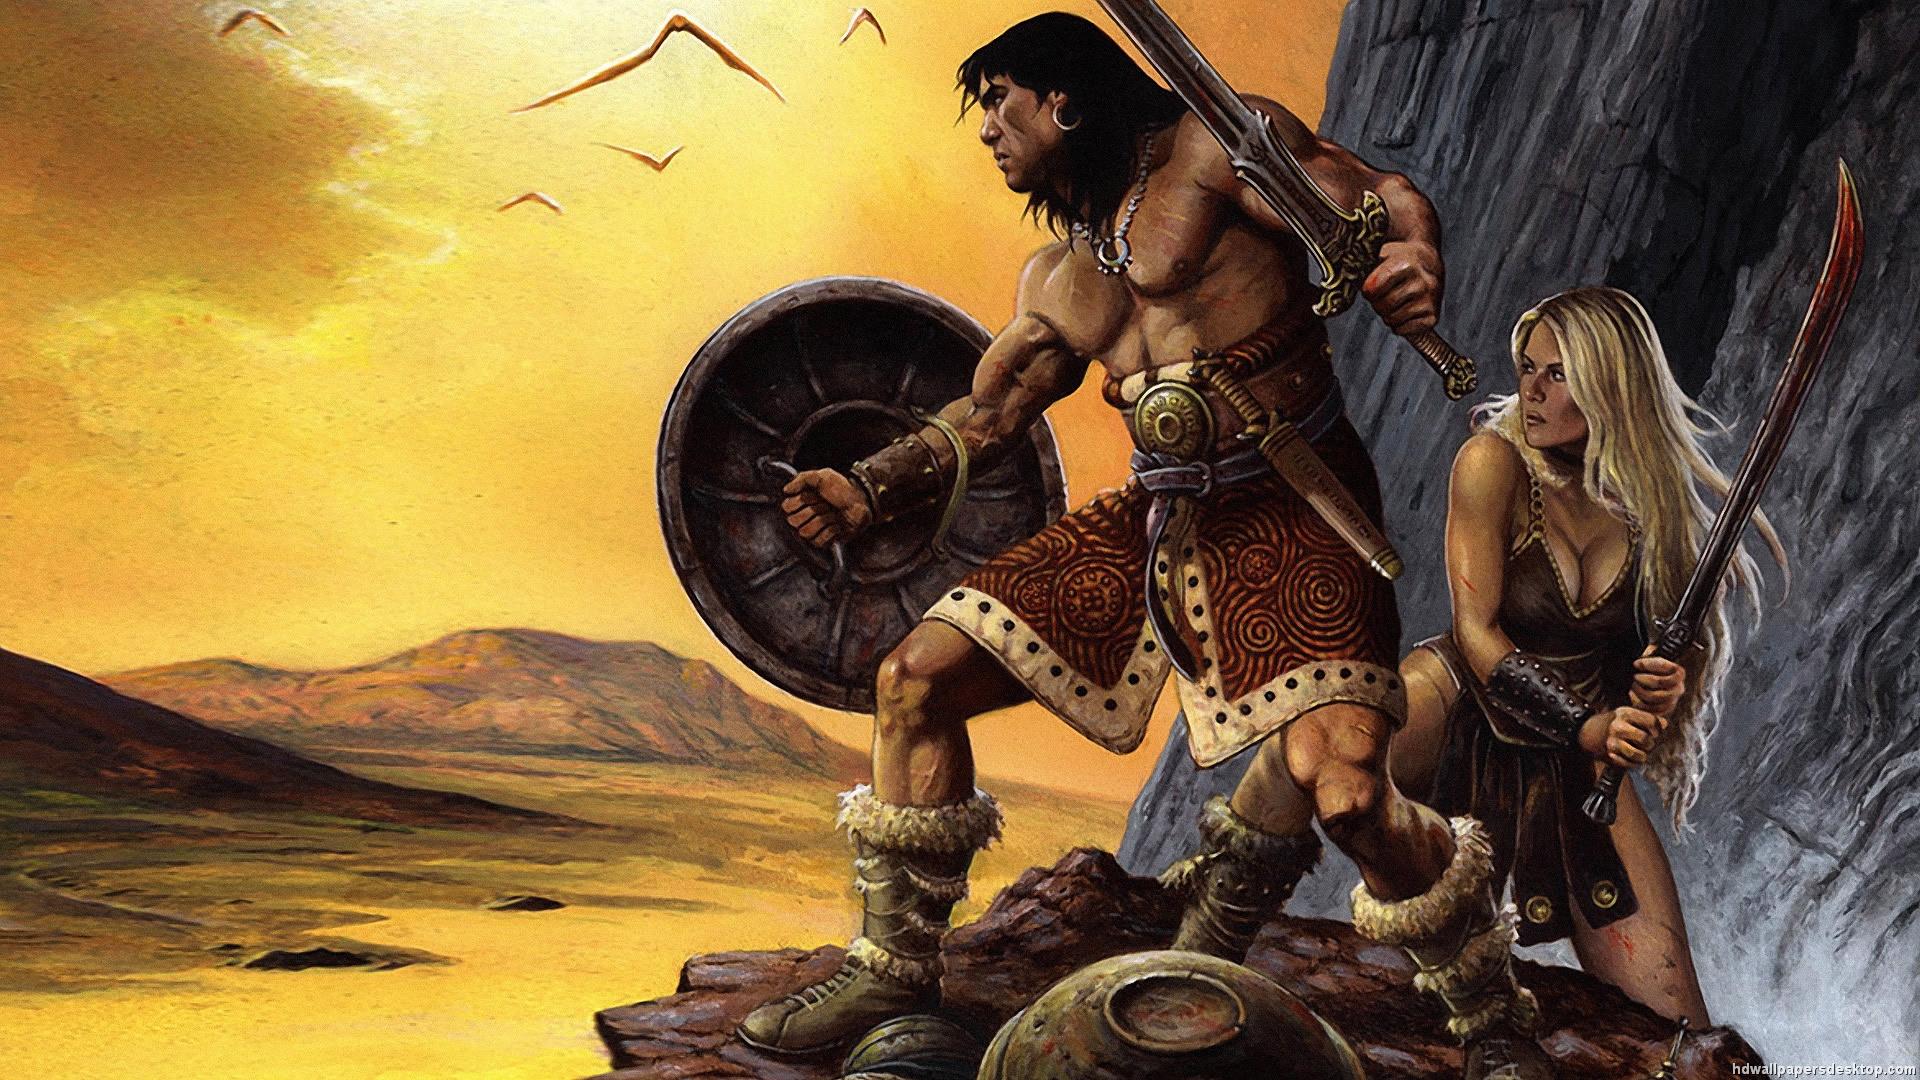 Conan the Barbarian Wallpaper Conan Red Sonja Wallpaper 1920x1080 1920x1080